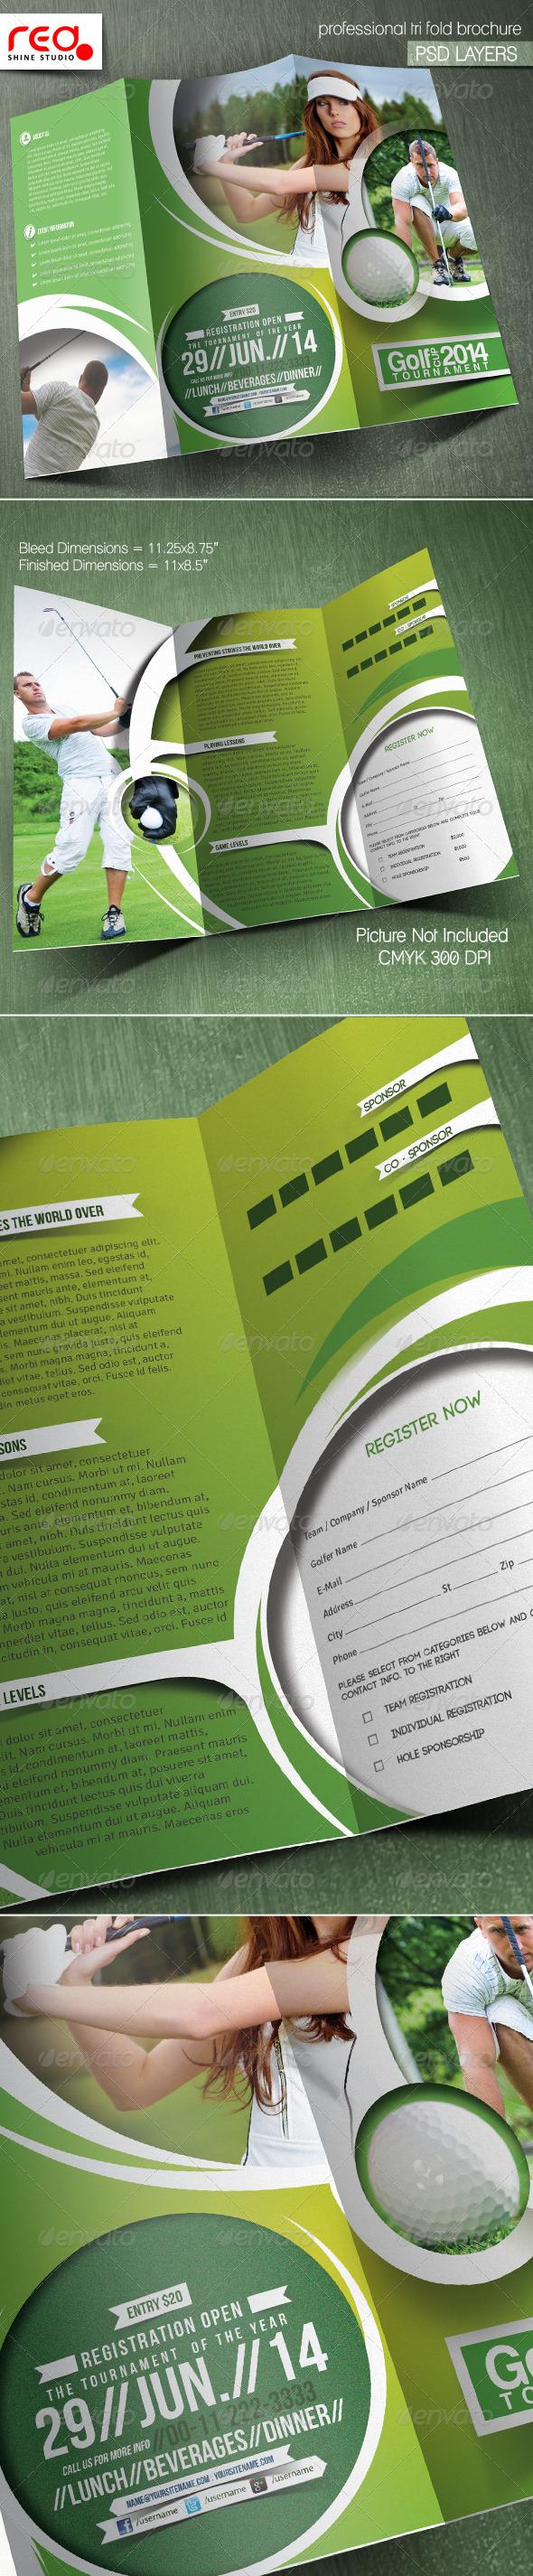 Golf Tournament Trifold Brochure Template - Catalogs Brochures